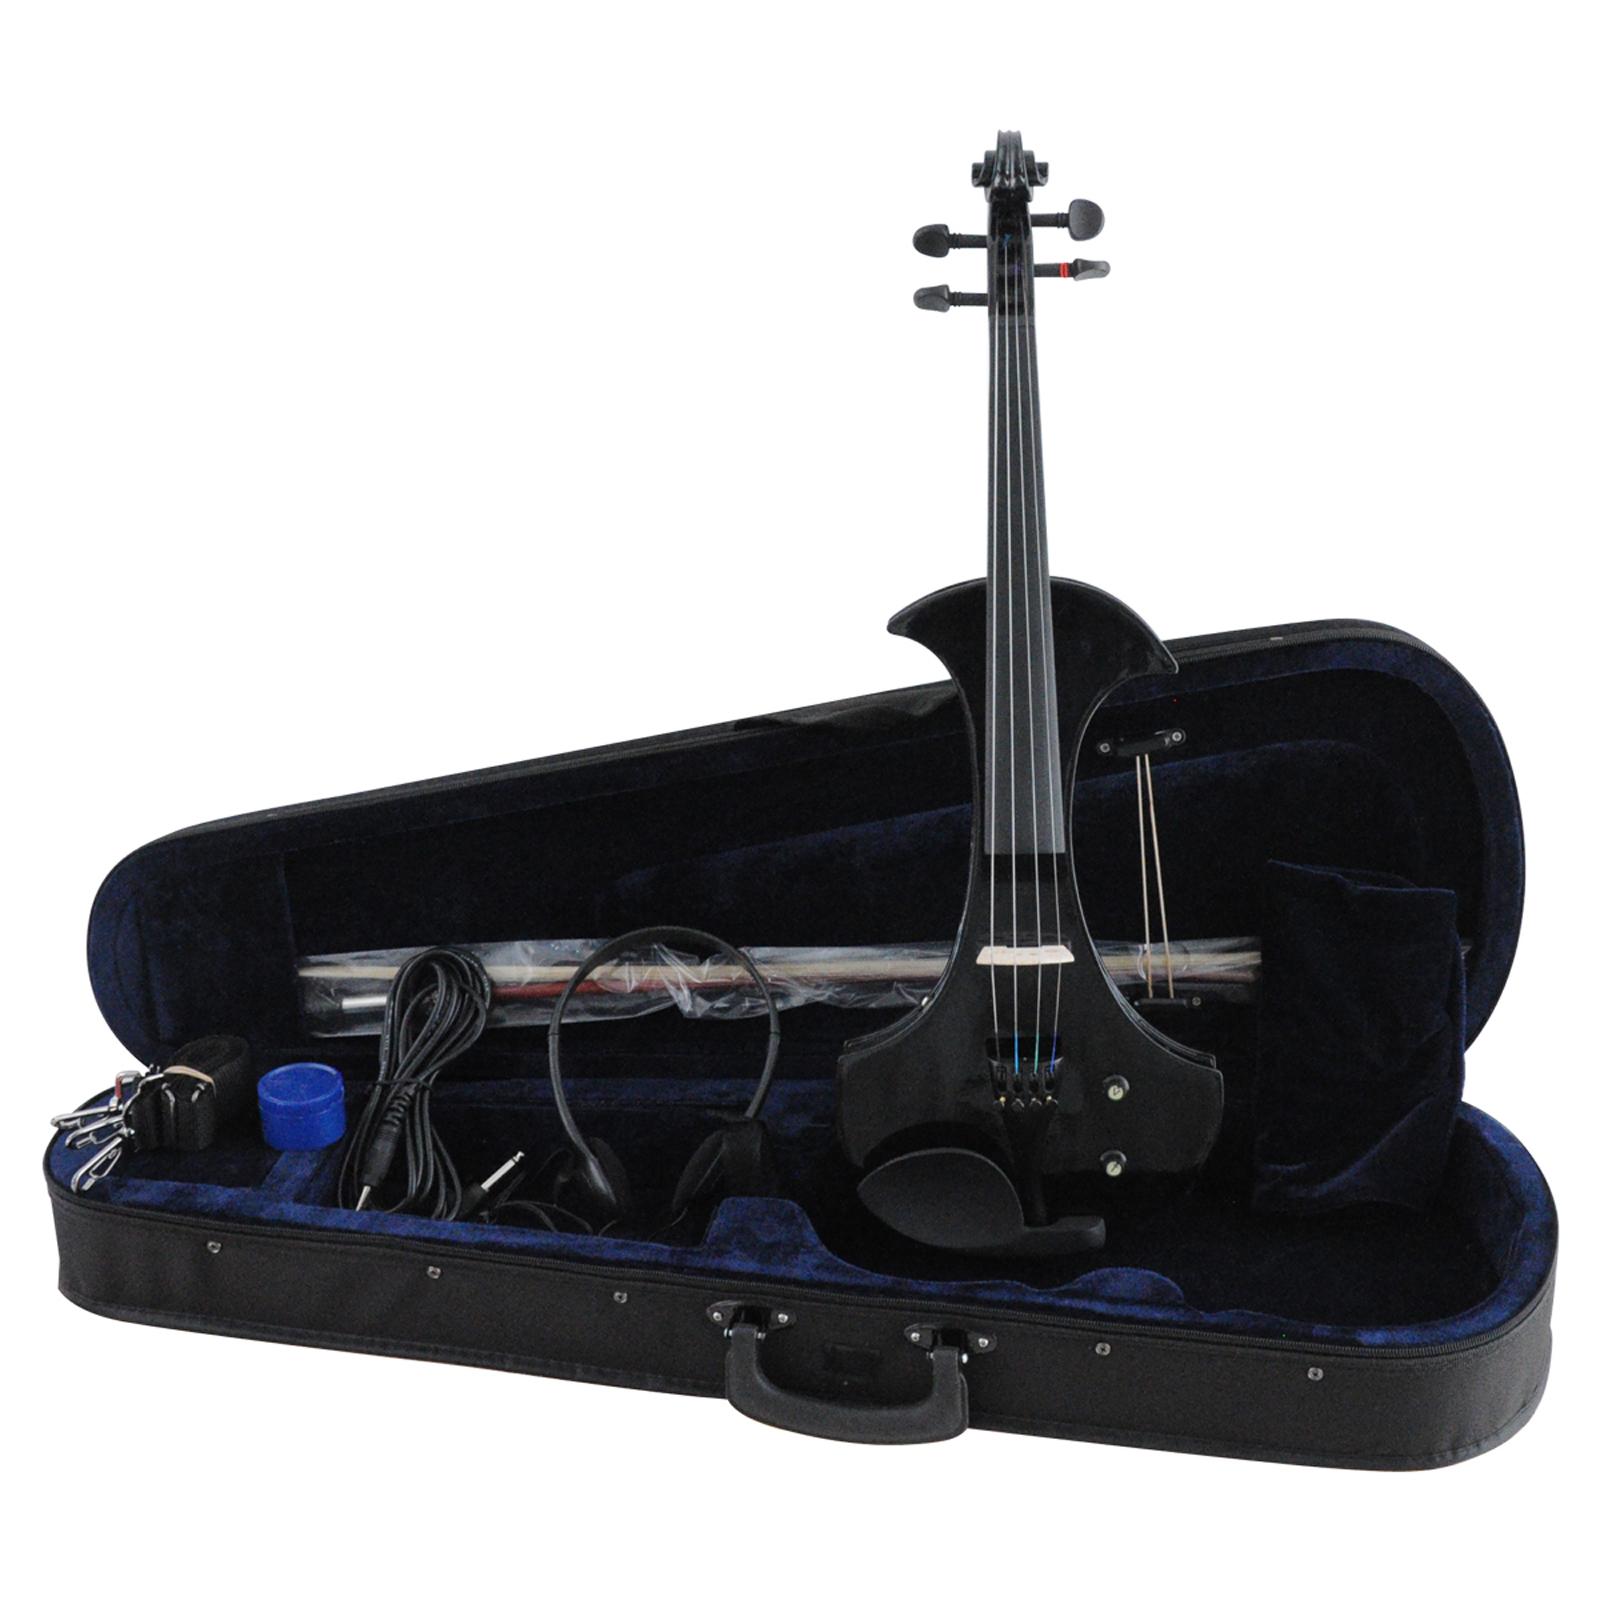 Aileen VE501- Black - 4/4 - Electric - Violin + Foam Case + Bow + Headphone 00061